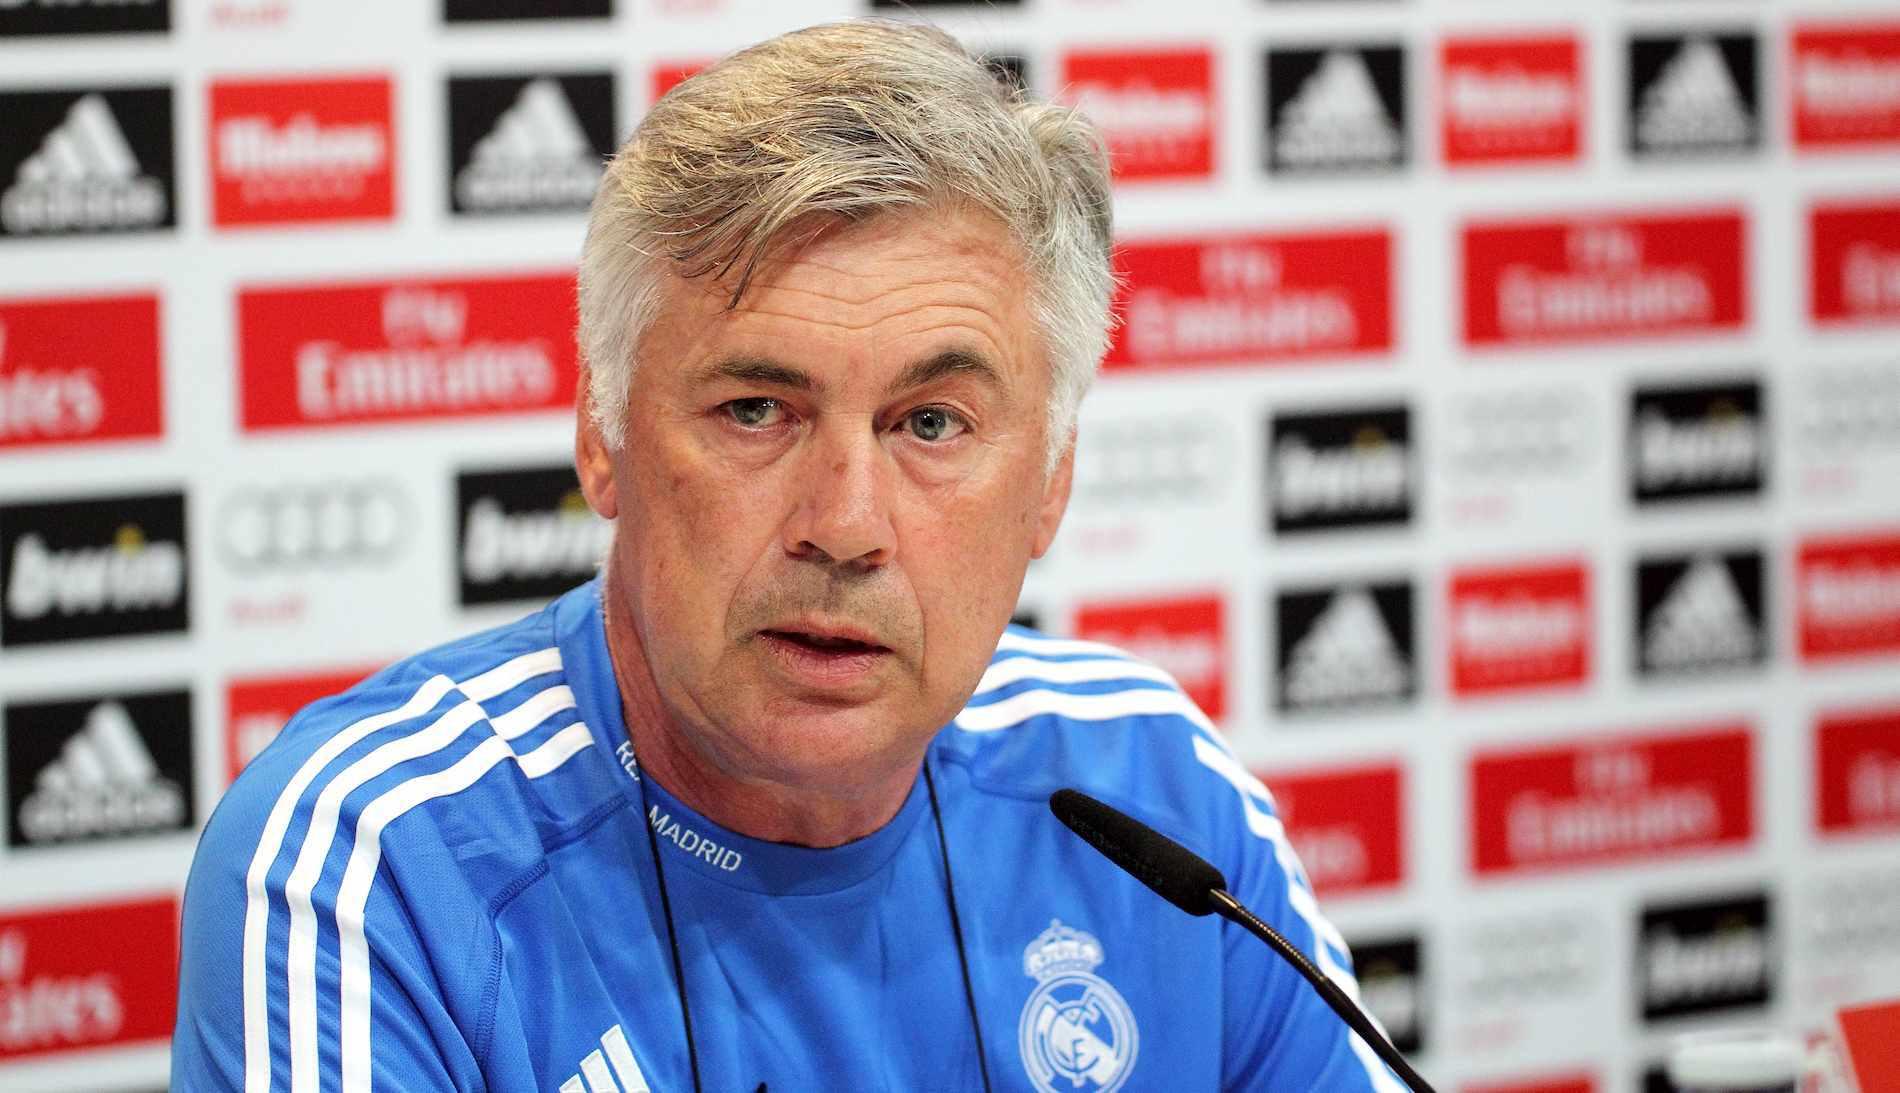 Carlo-Ancelotti-en-rueda-de-prensa